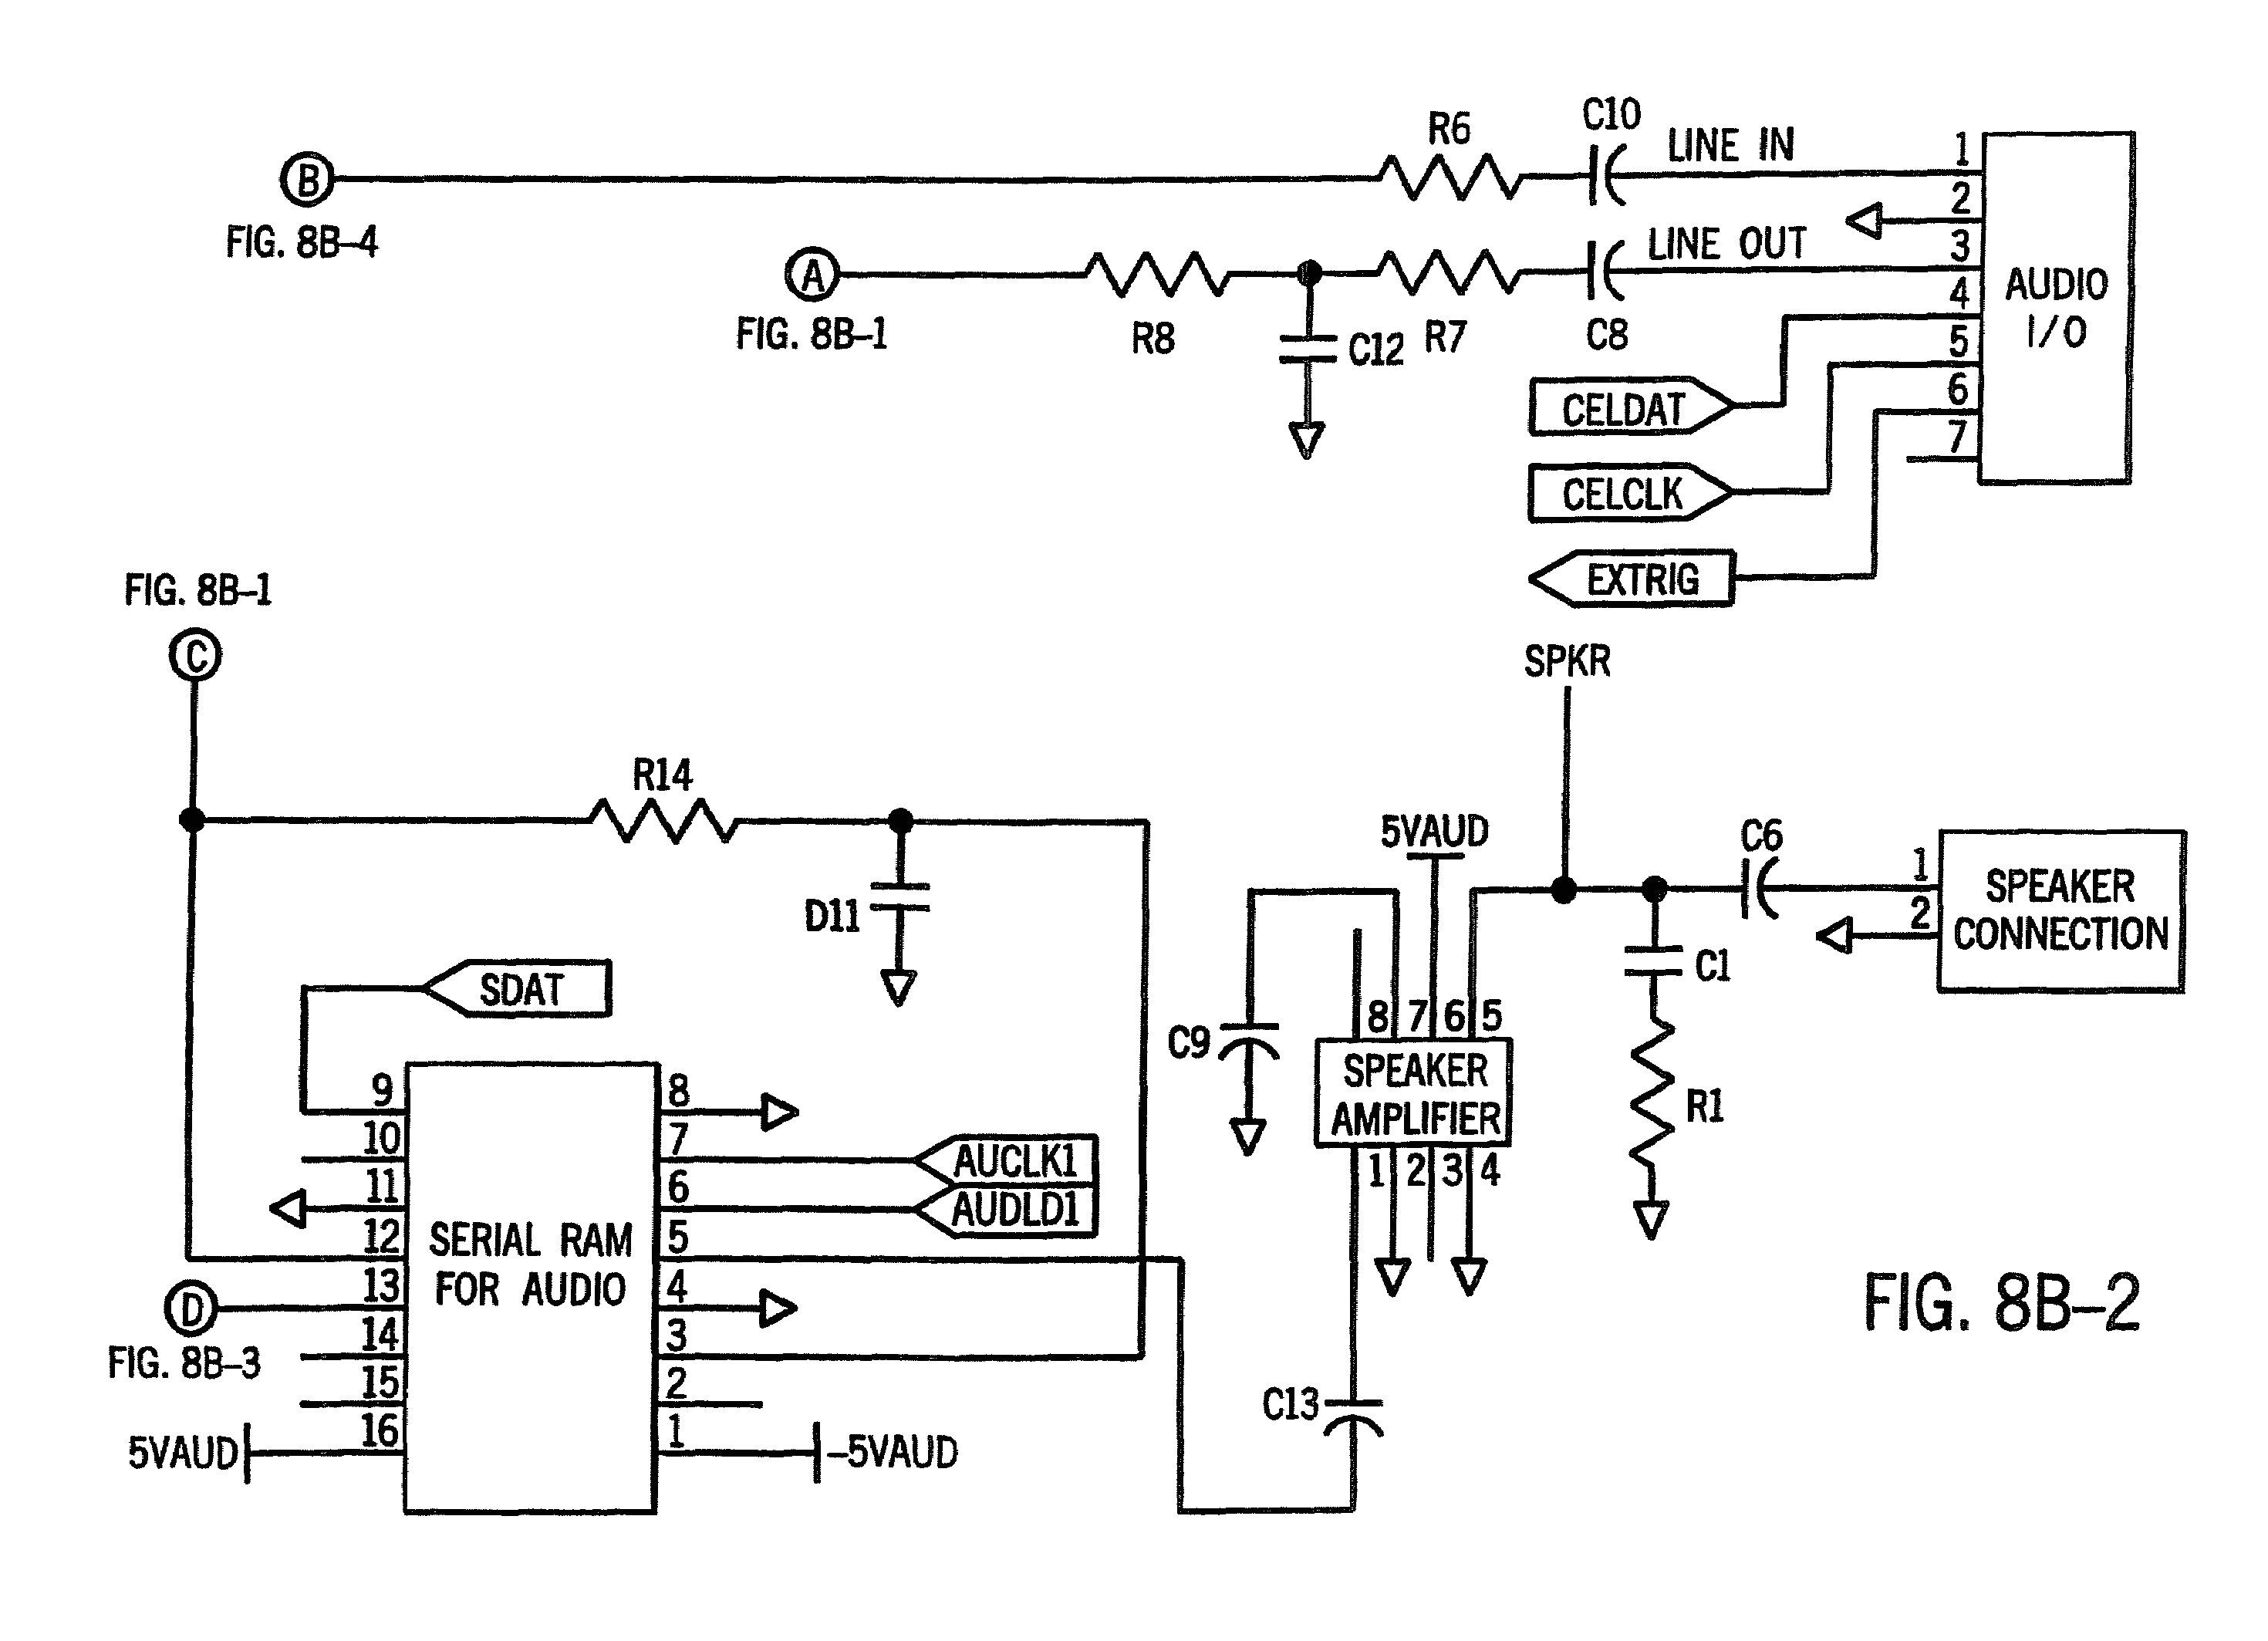 goldstar gps wiring diagram the wiring diagram lamp ca gps wiring diagram